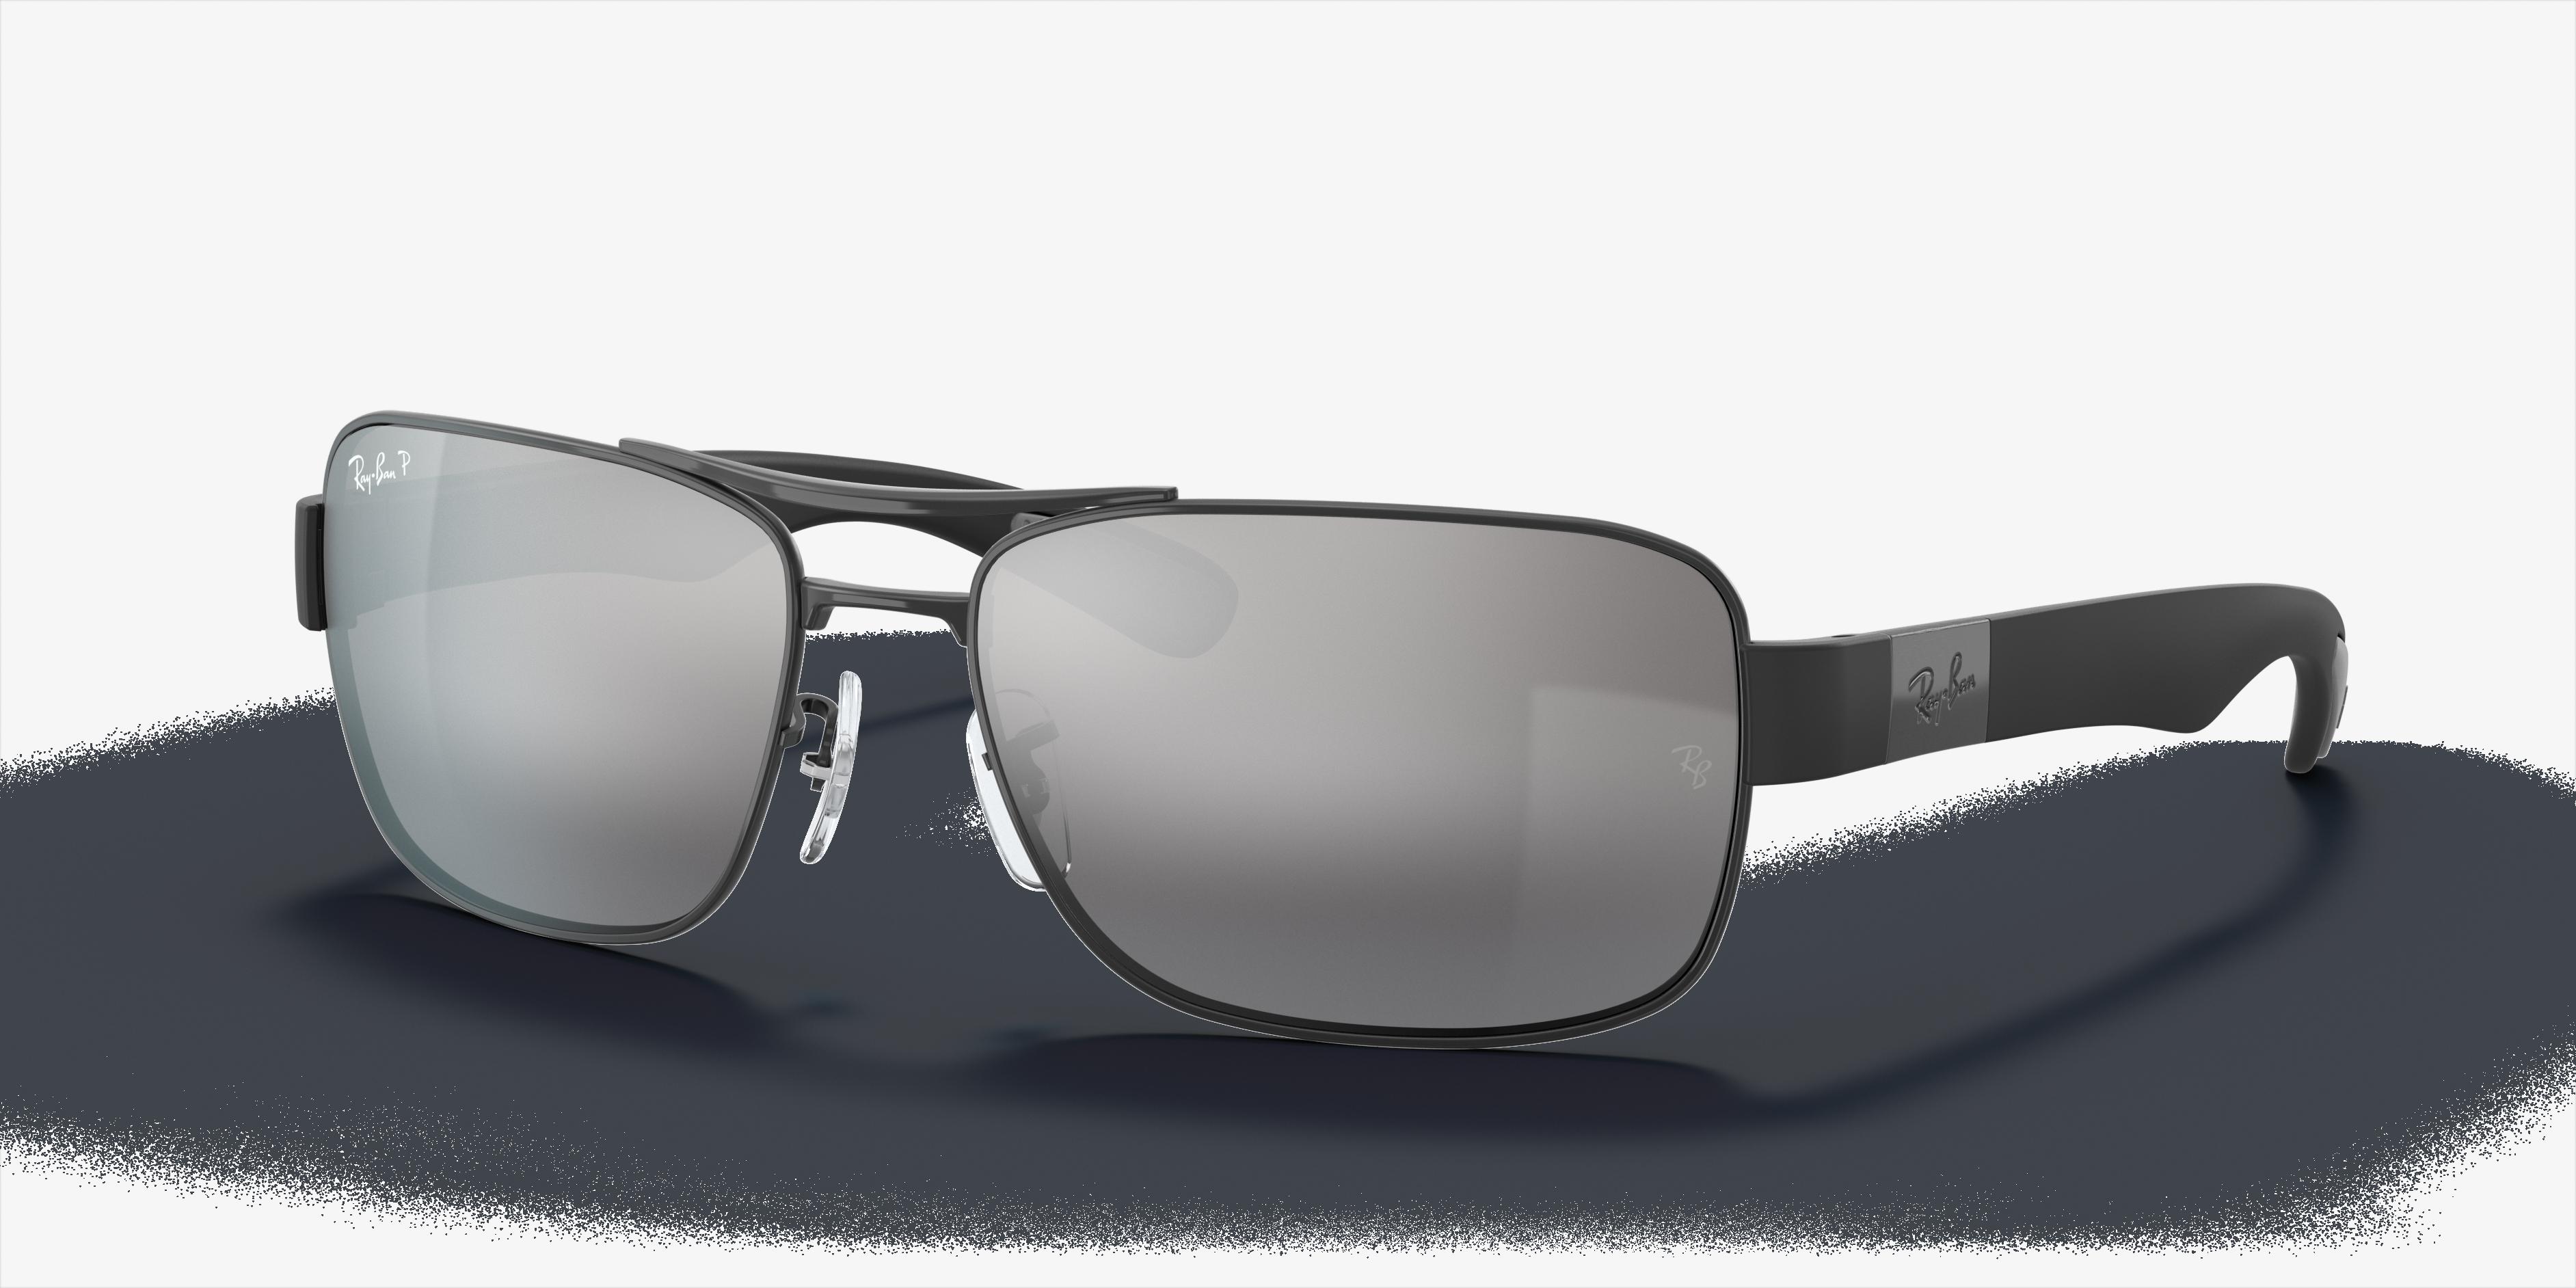 Ray-Ban Rb3522 Black, Polarized Gray Lenses - RB3522